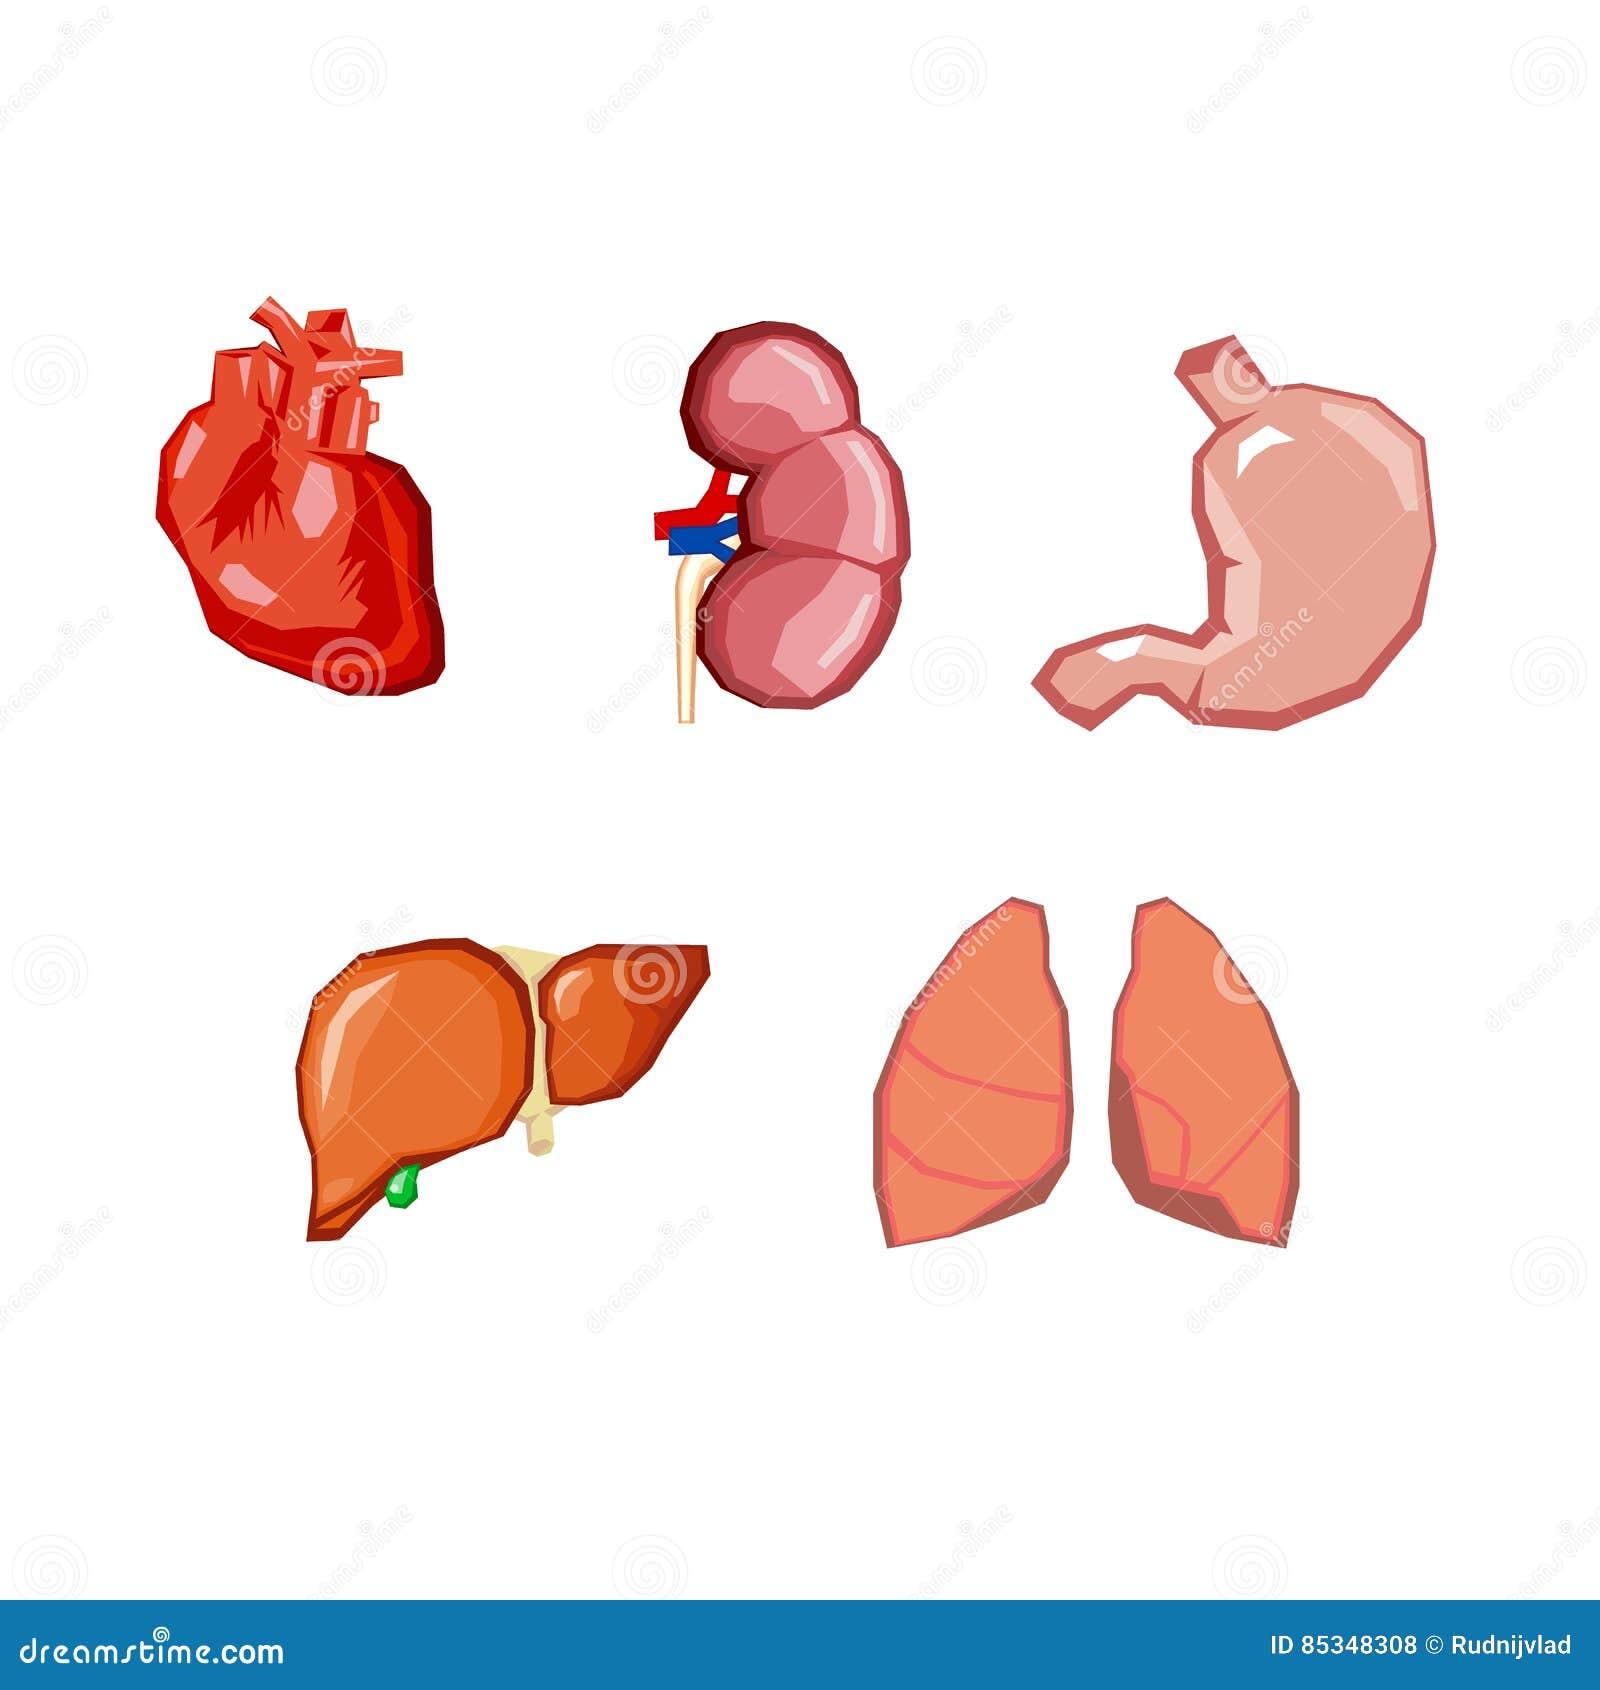 Human Organs Internal Organs Set Human Anatomy Internal Parts Of